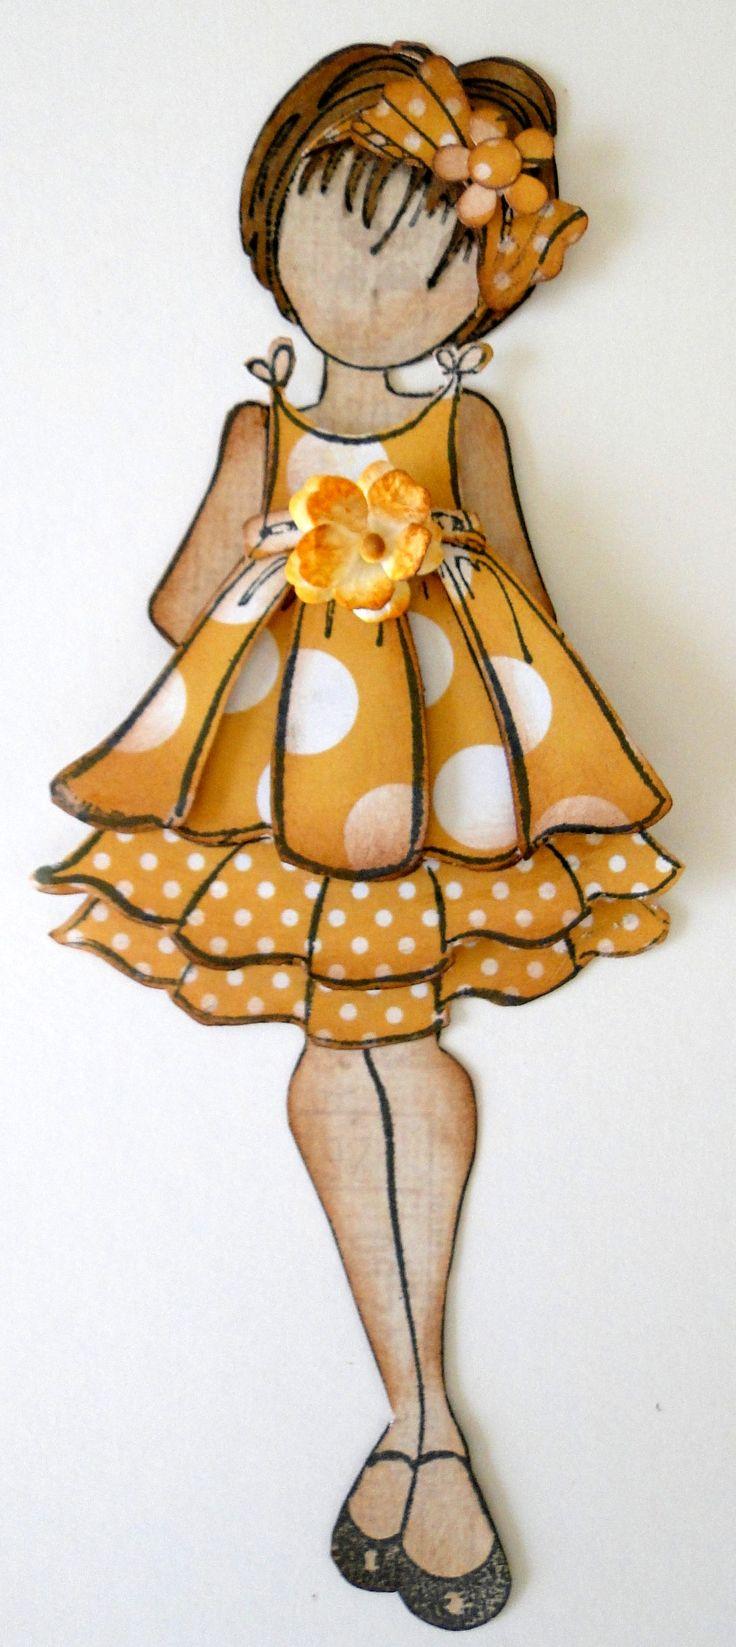 http://www.pinterest.com/cdepol/she-art-julie-nutting-designs/    Prima Pper Doll - Scrapbook.com